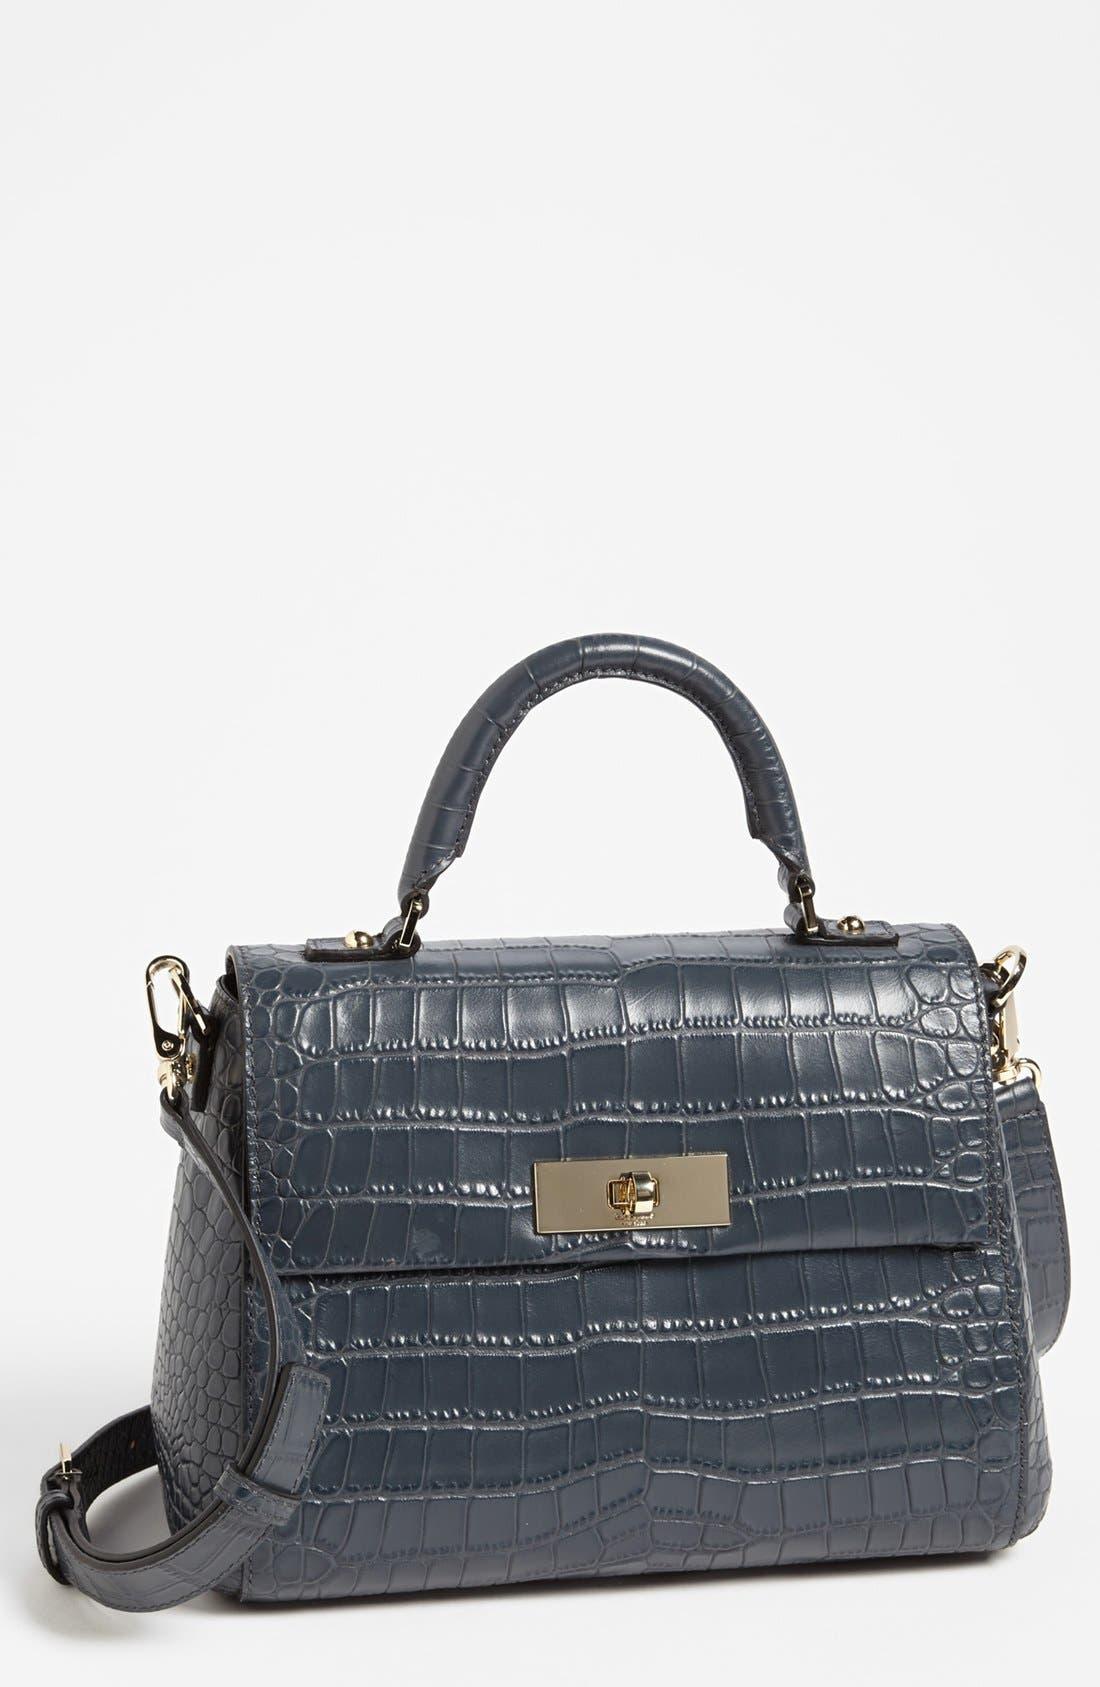 Main Image - kate spade new york 'oxford street - nadine' satchel, small